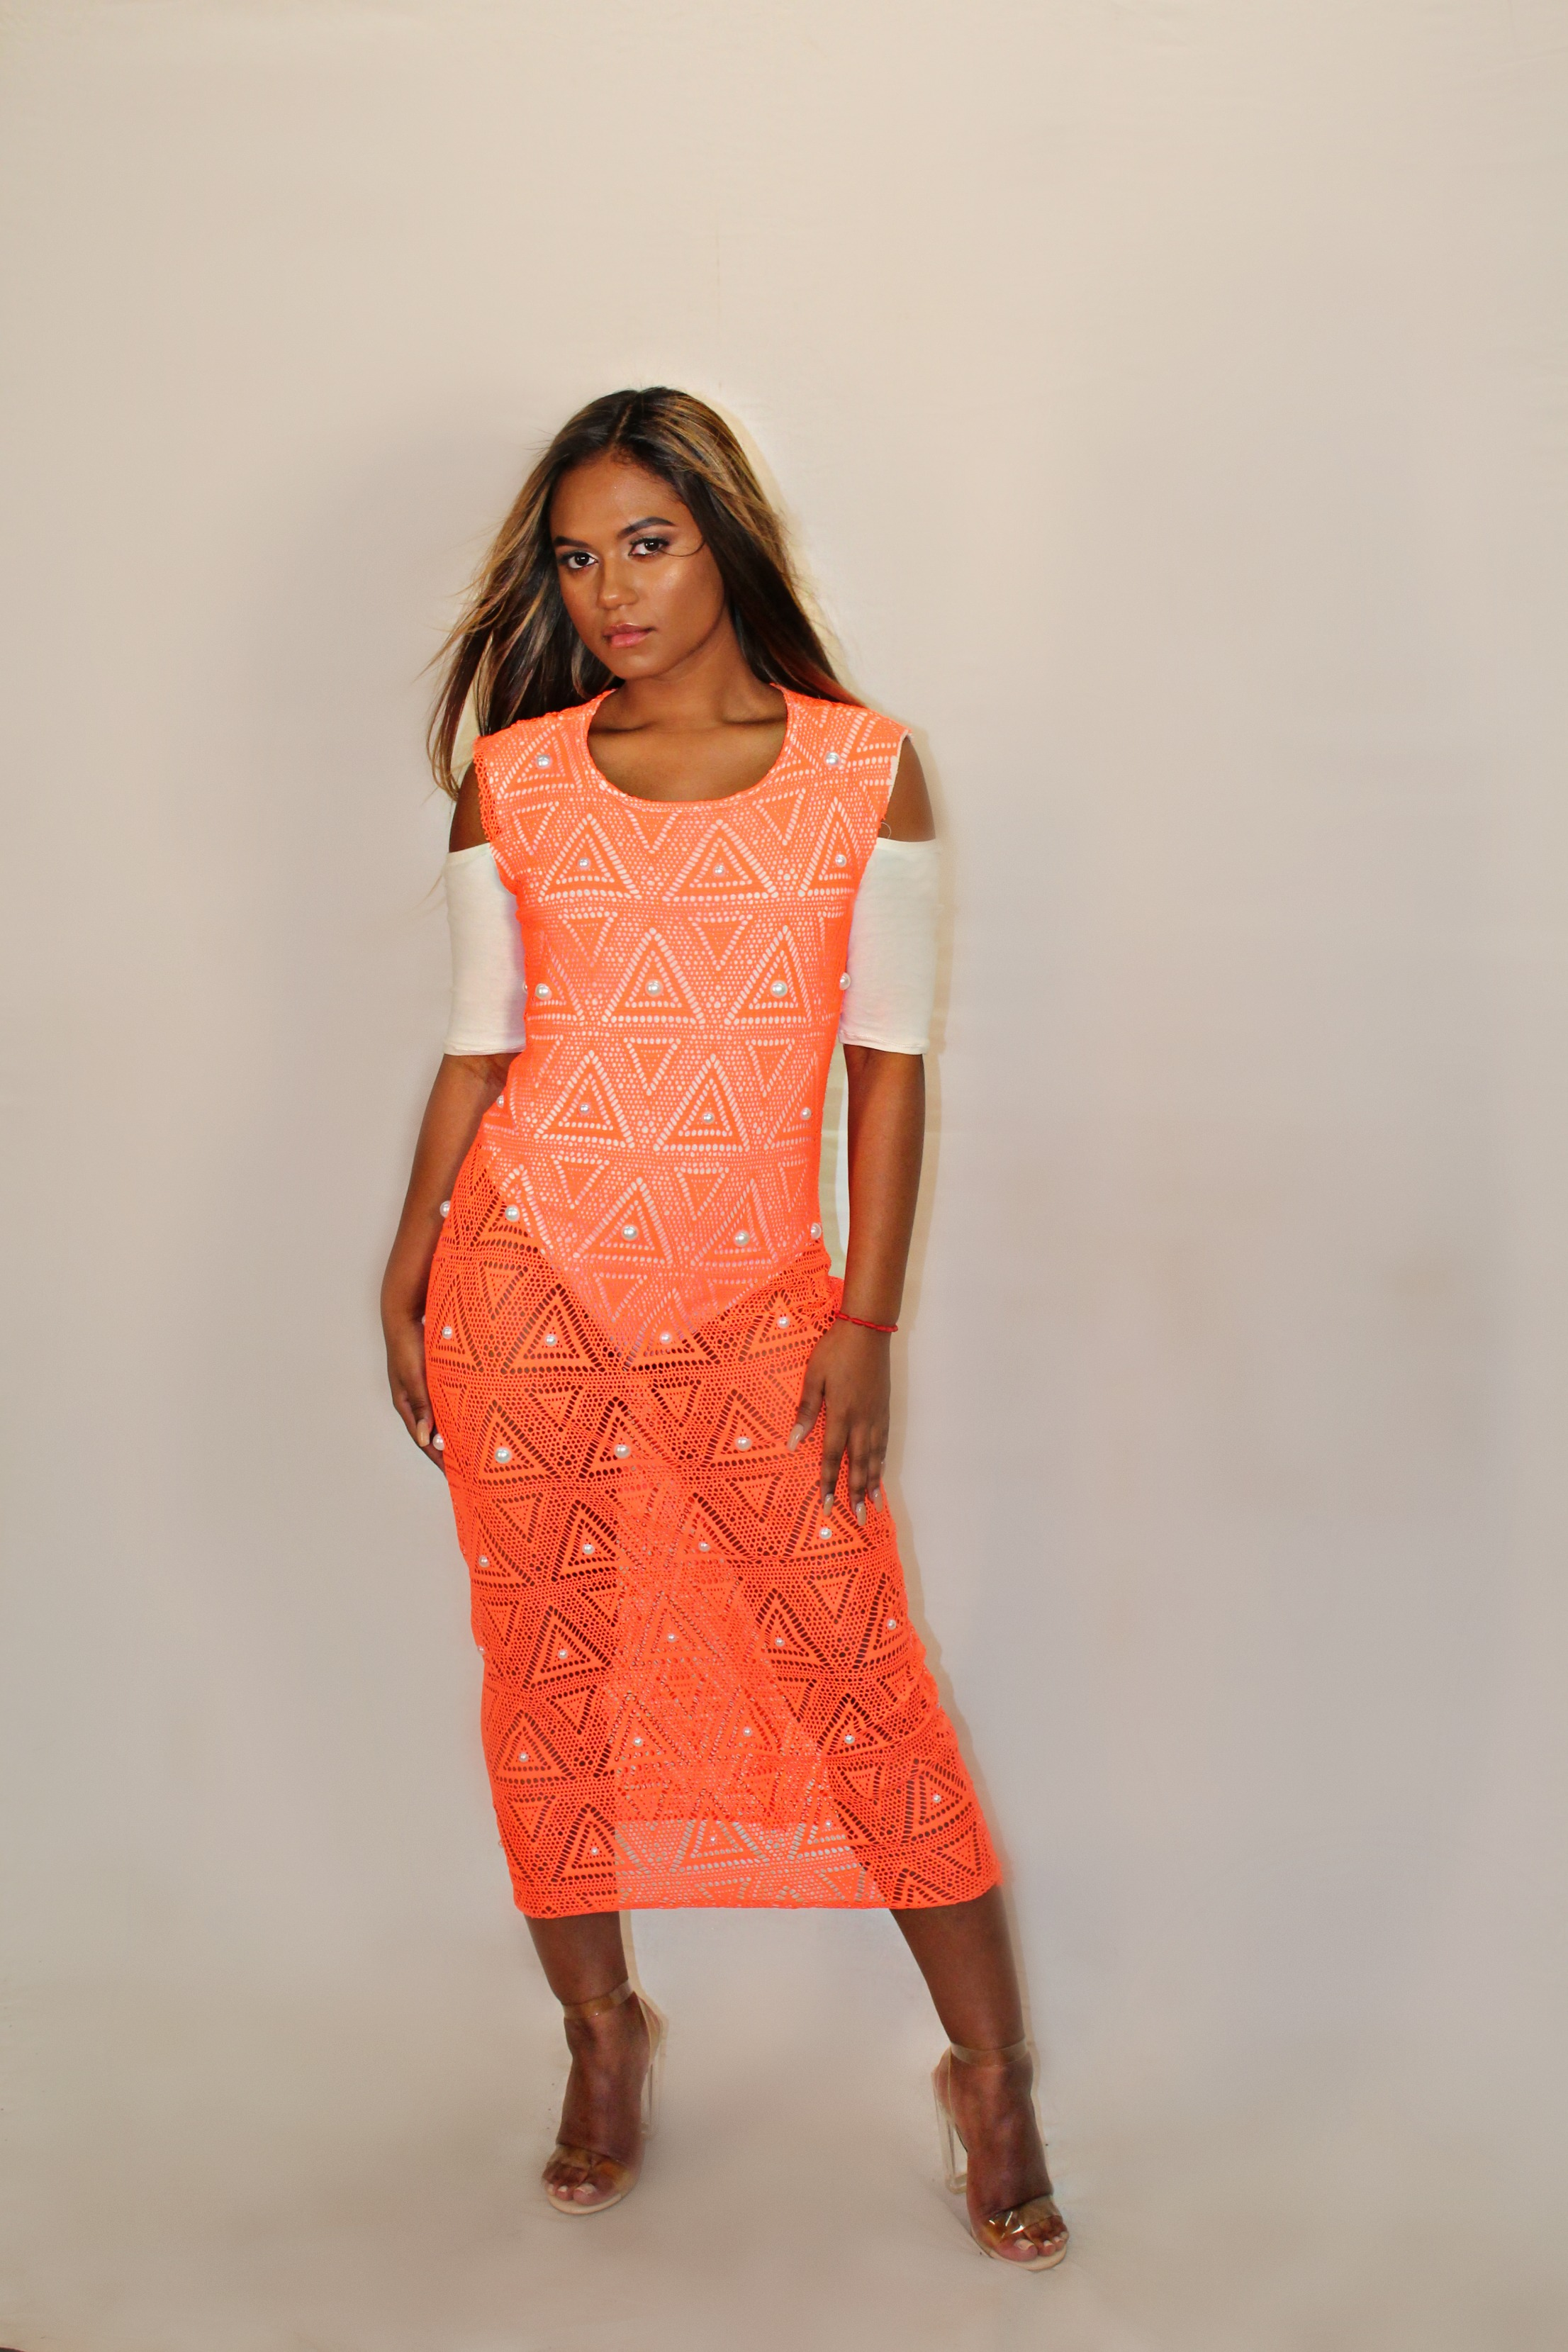 Jenny Pearl Orange dress